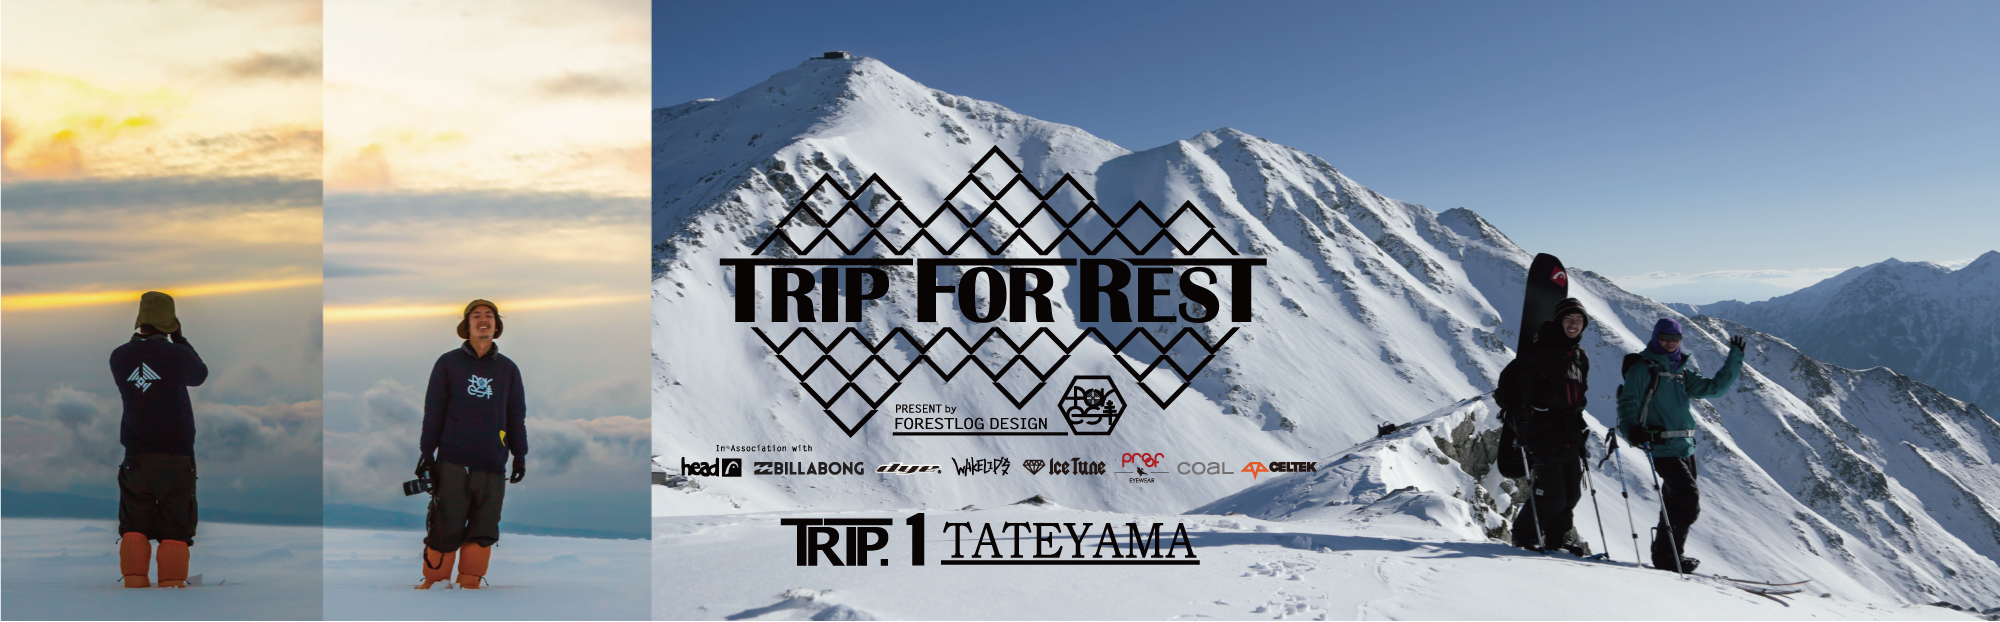 TRIP-1-TATEYAMA14